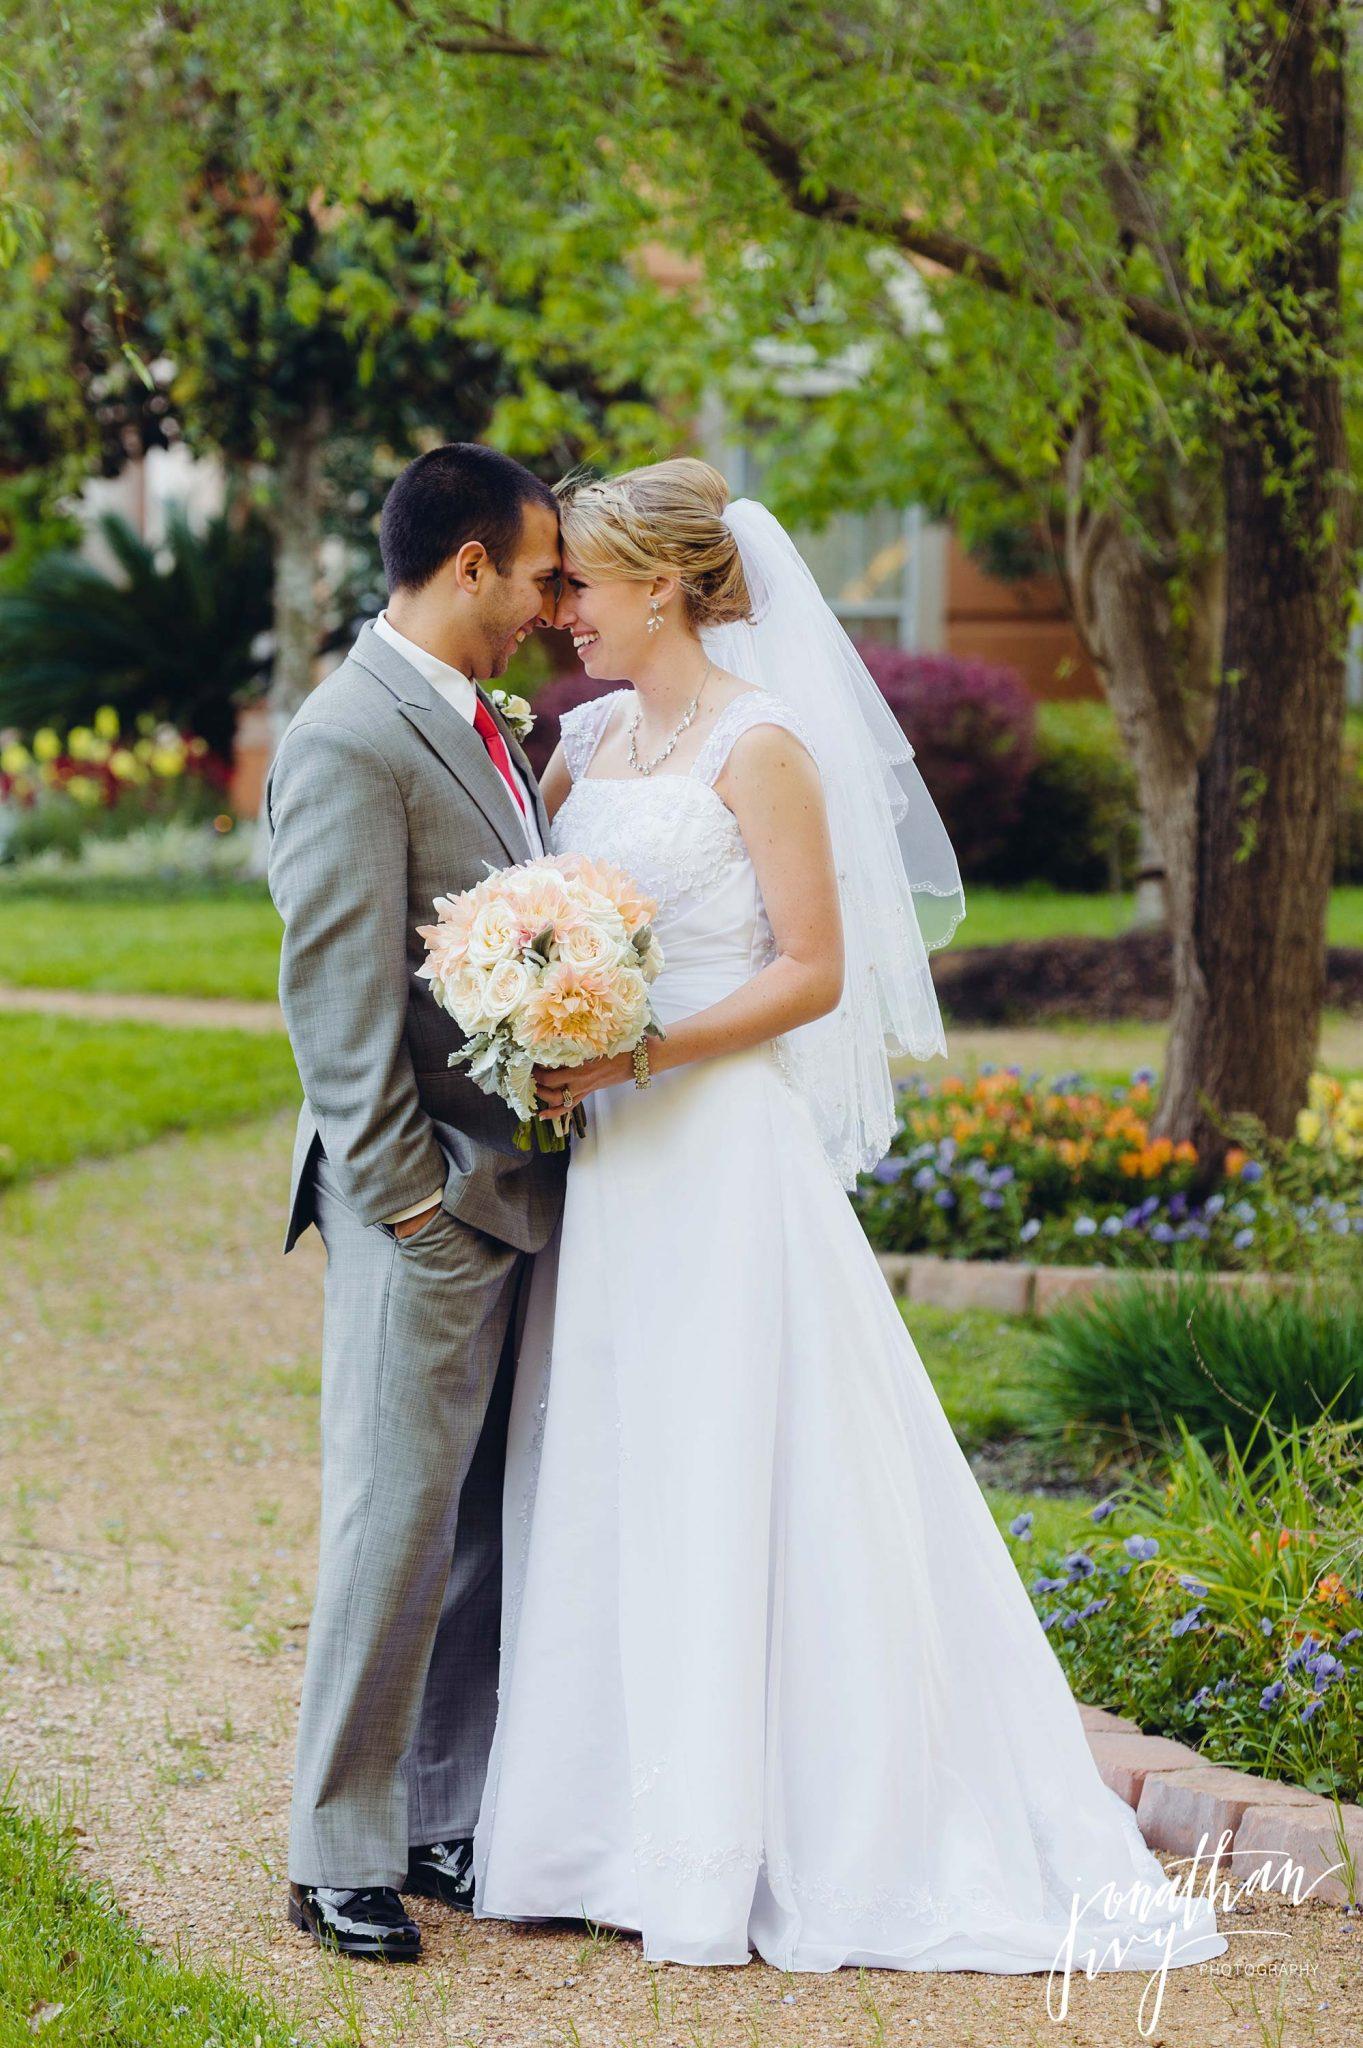 Chateau-polonez-wedding-houston_0027